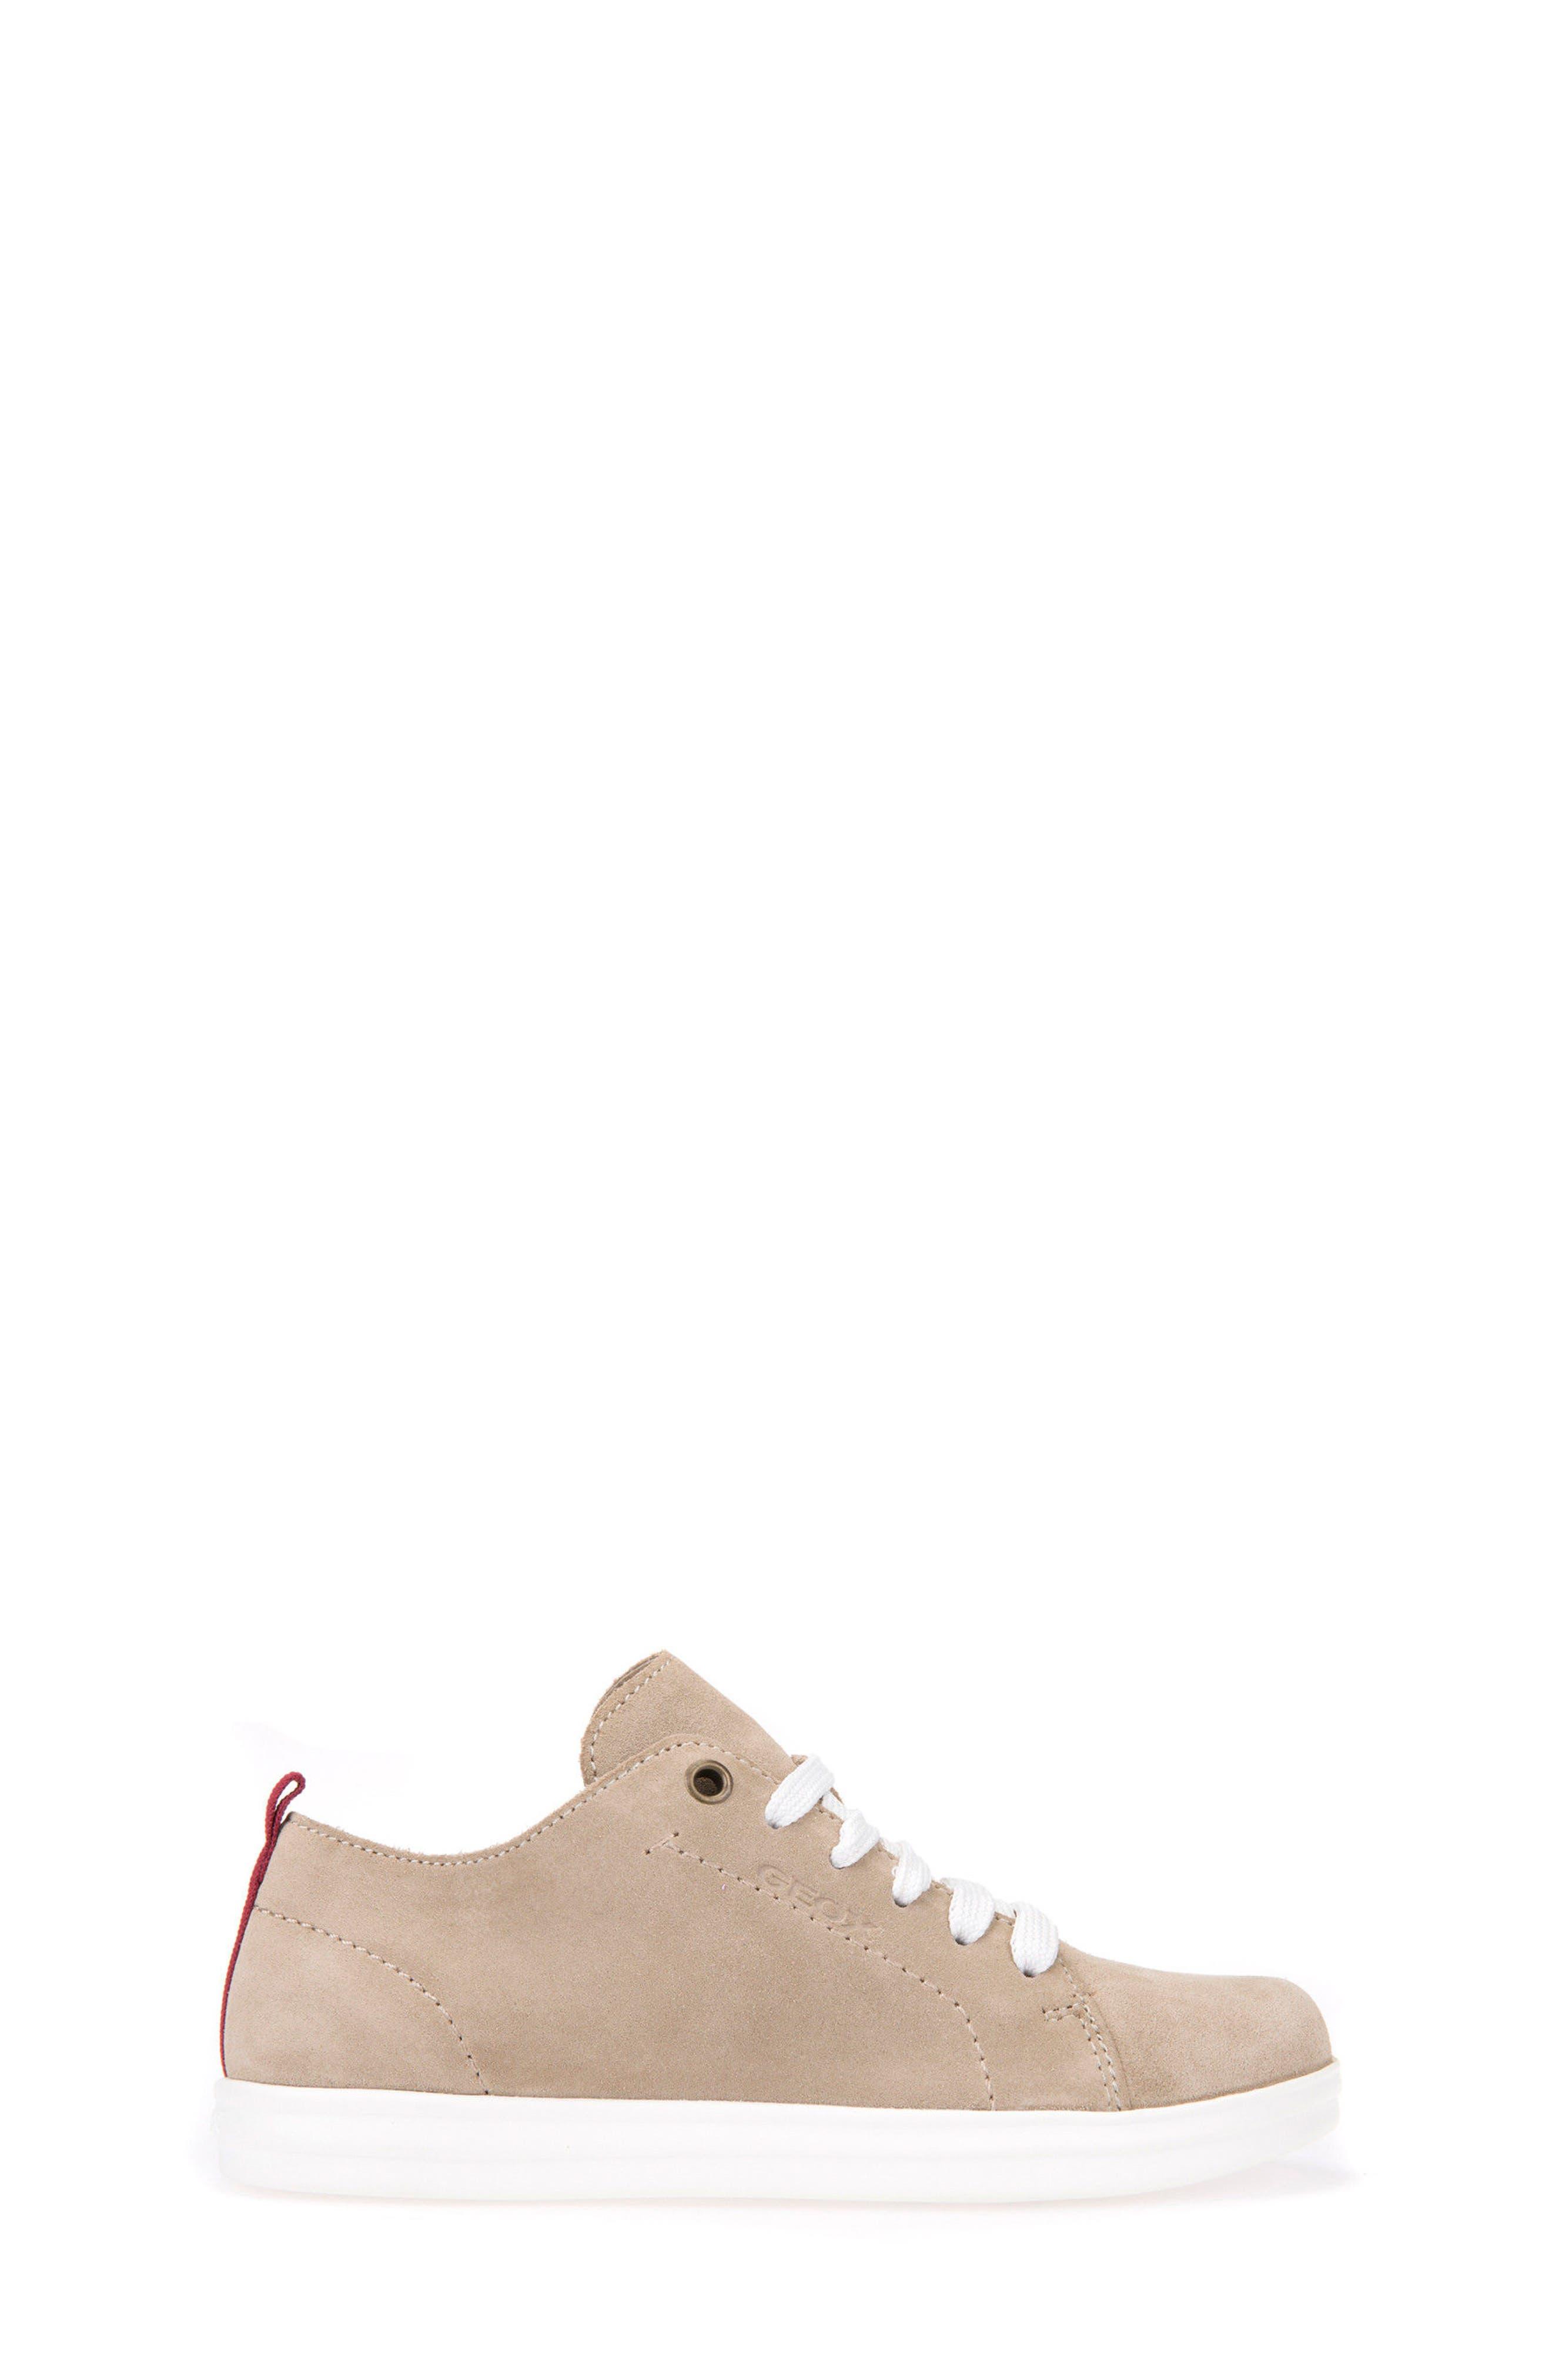 Anthor Low Top Sneaker,                             Alternate thumbnail 3, color,                             BEIGE